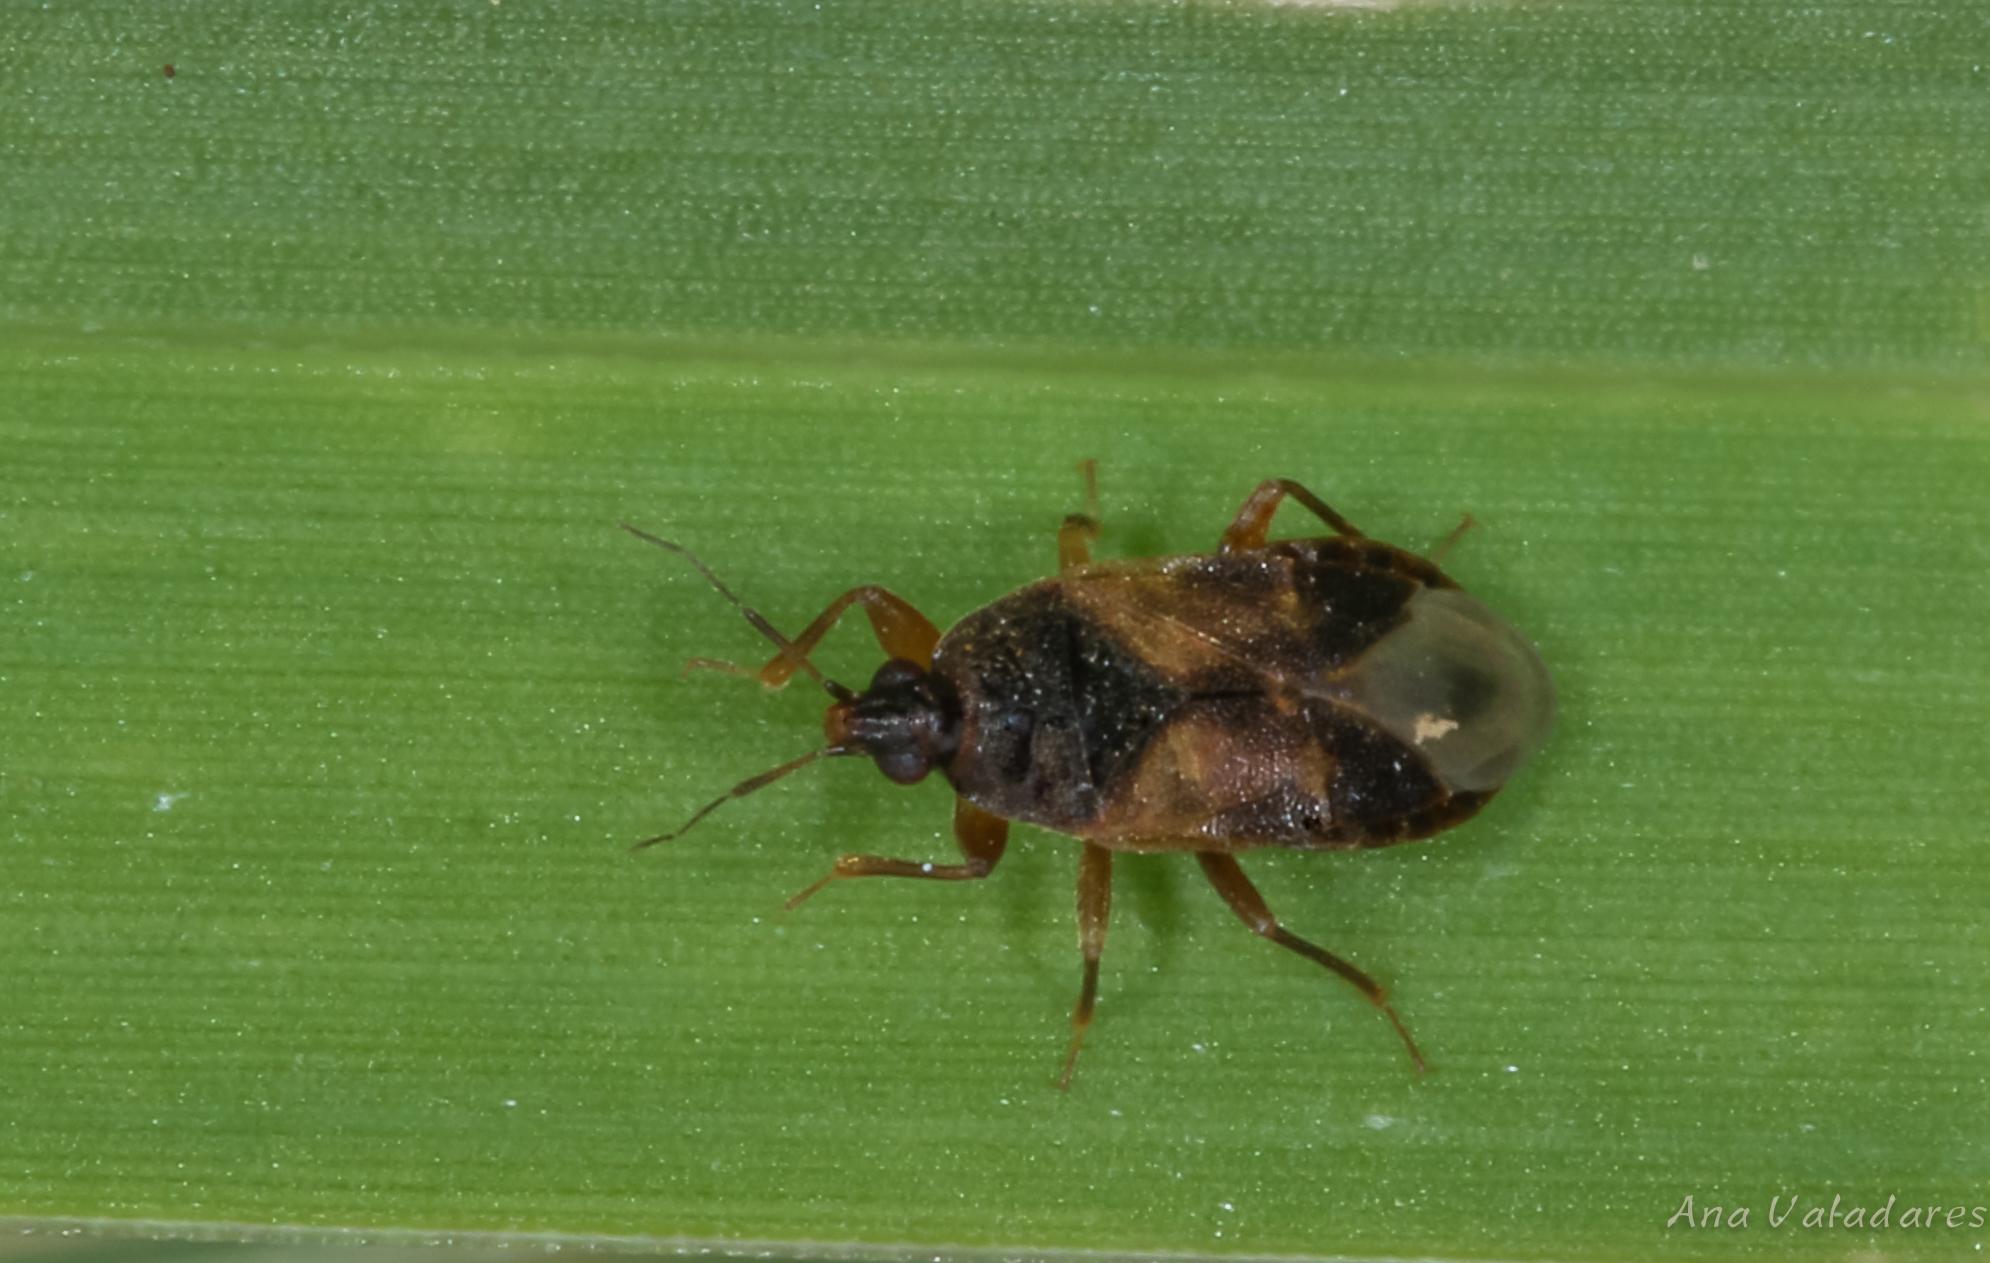 Lyctocoris campestris